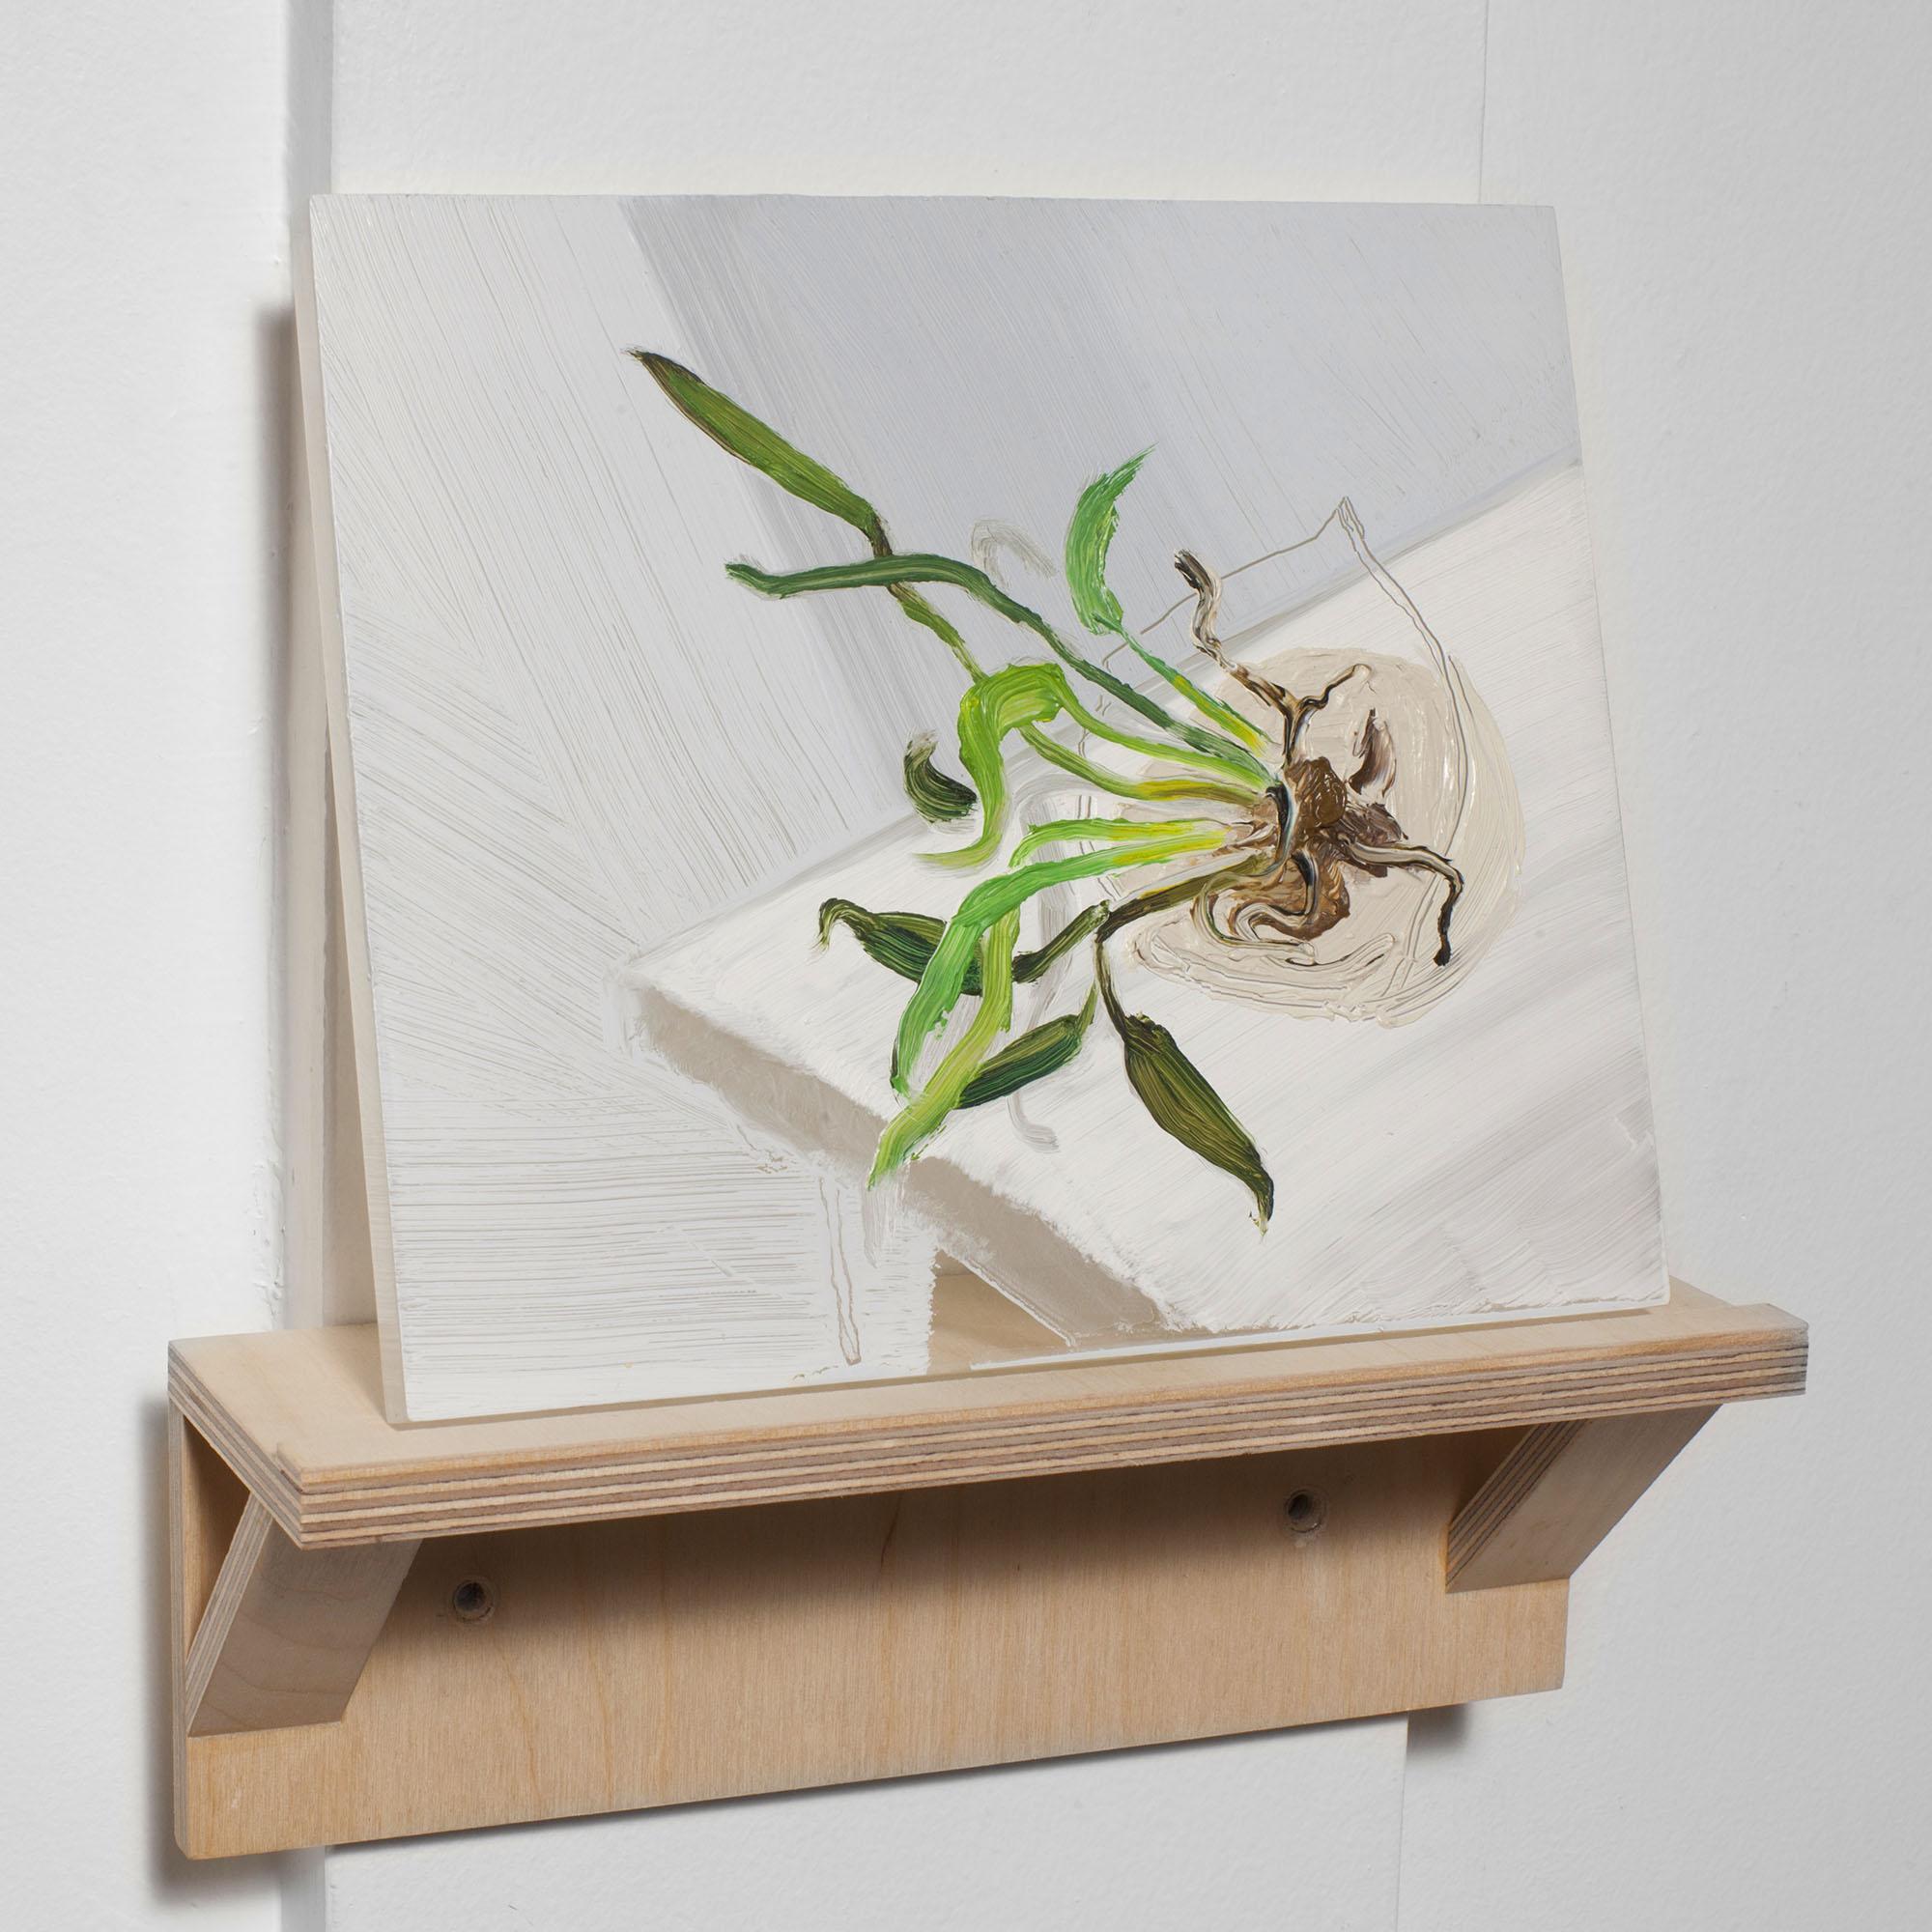 Near-Death Experience (Siamese Fighting Fish)    2015  8 x 8 x 0.5 inches  oil on half inch plexiglass, artist made birch shelf   ⬜     Experiência de Quase-Morte (Peixe de Luta Siamês)    2015  óleo sobre acrílico, prateleira de bétula  Pintura 20 x 20 x 1.27 cm., prateleira 10 x 25.5 x 9cm.